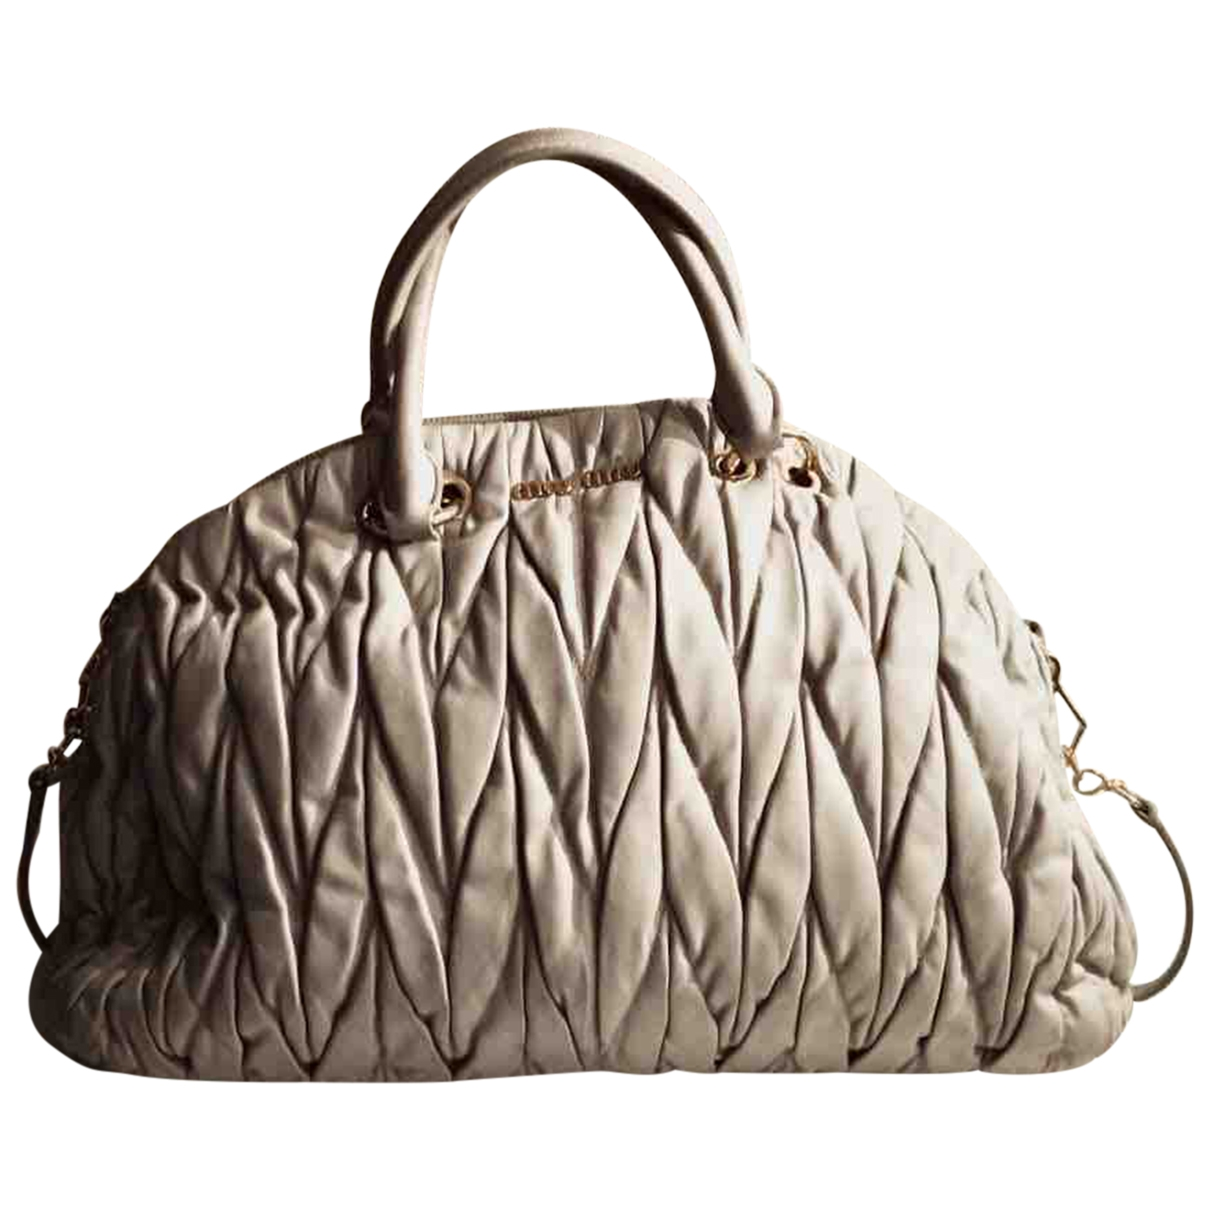 Miu Miu Matelassé Grey Leather handbag for Women \N